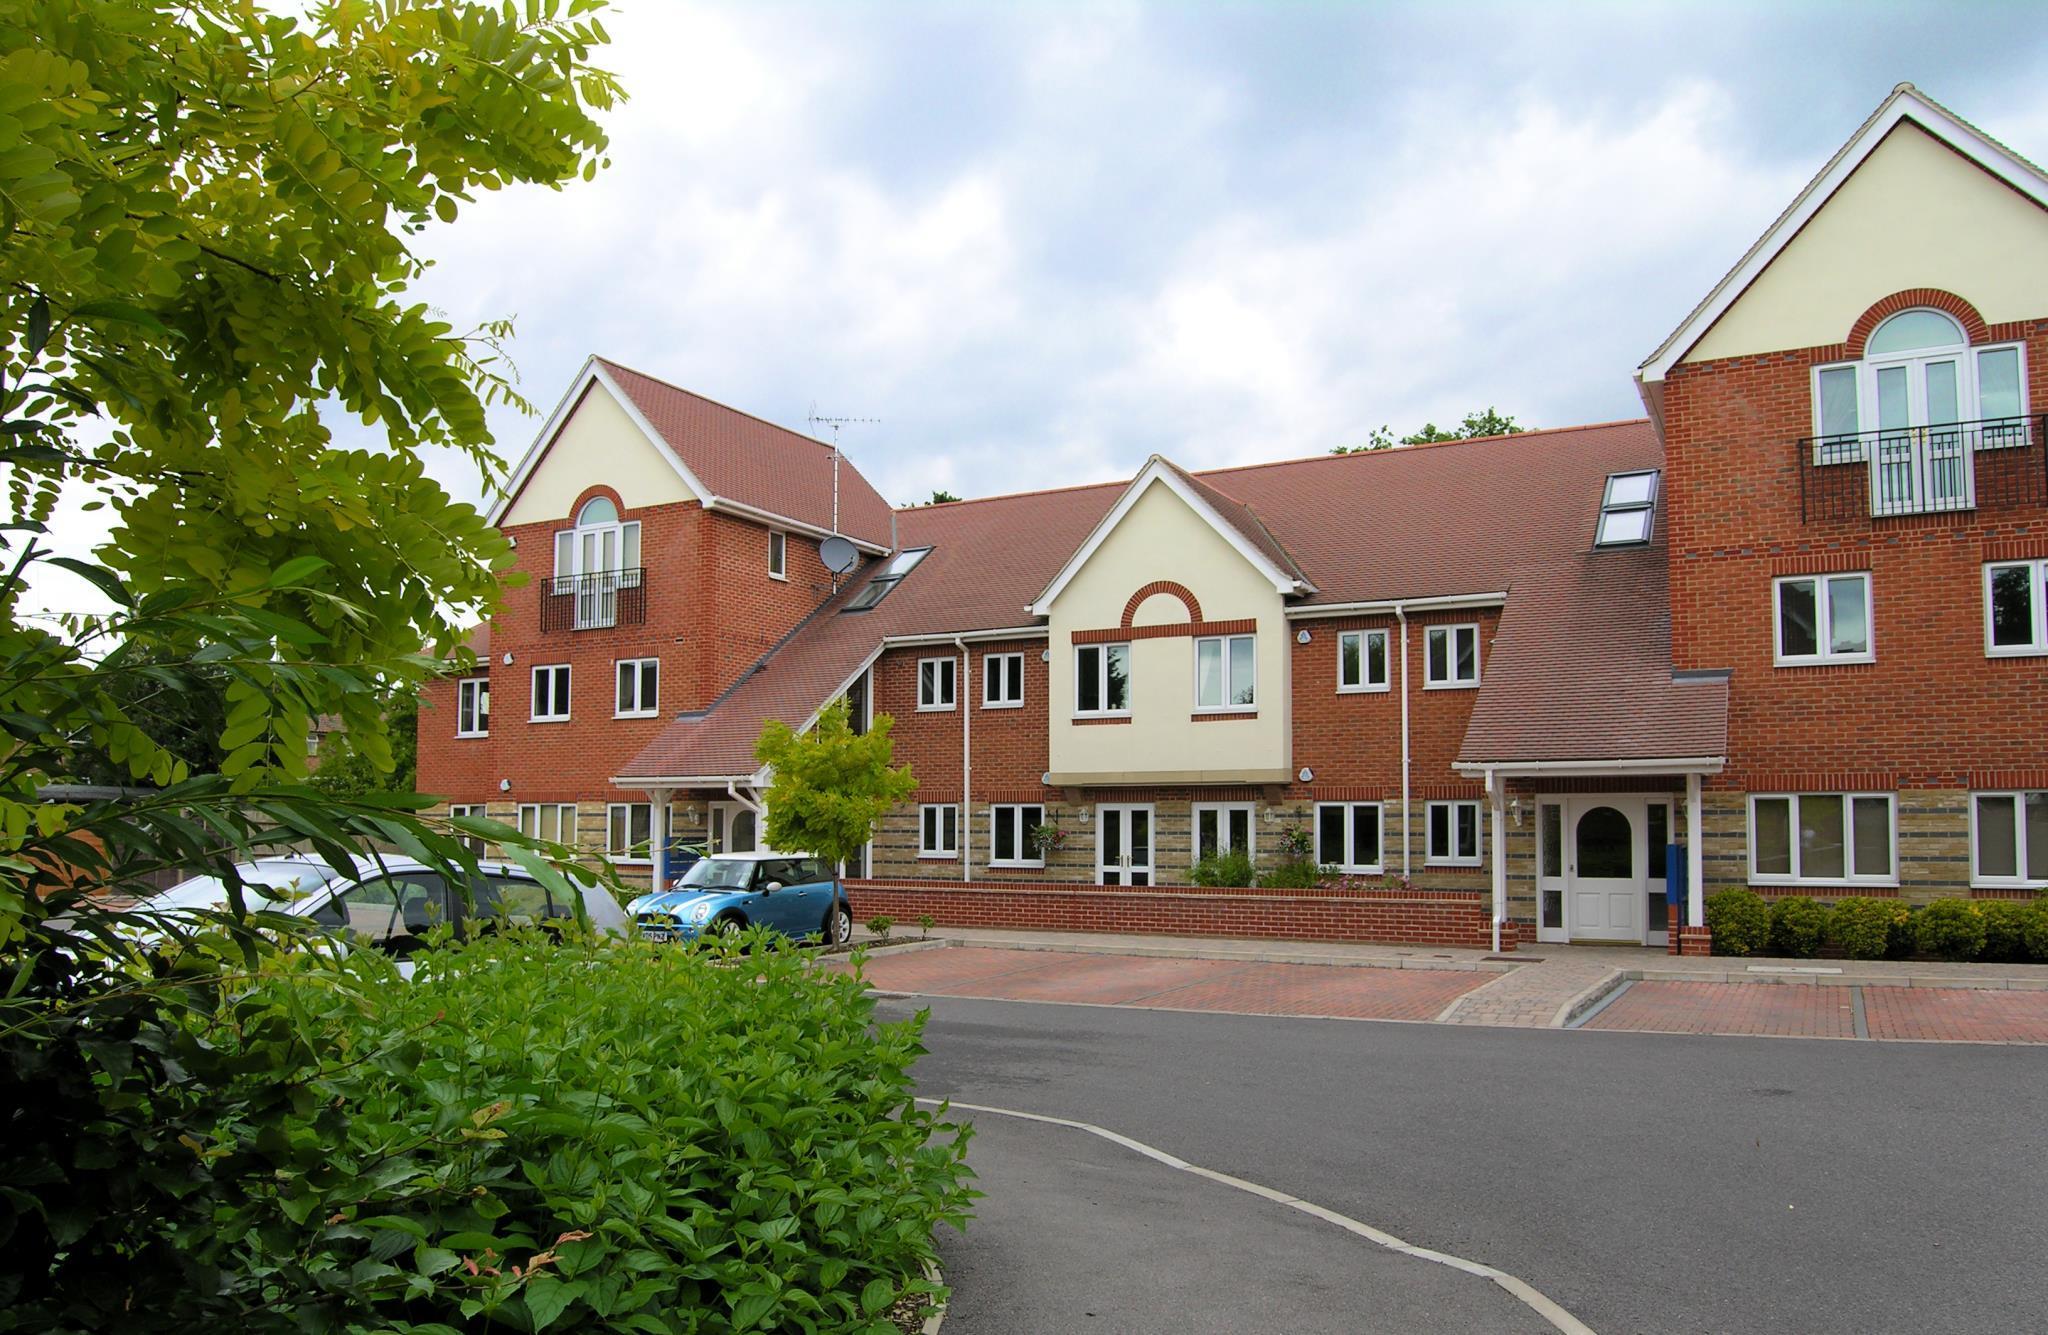 Berkshire Rooms Ltd - Gray Place, Bracknell Forest